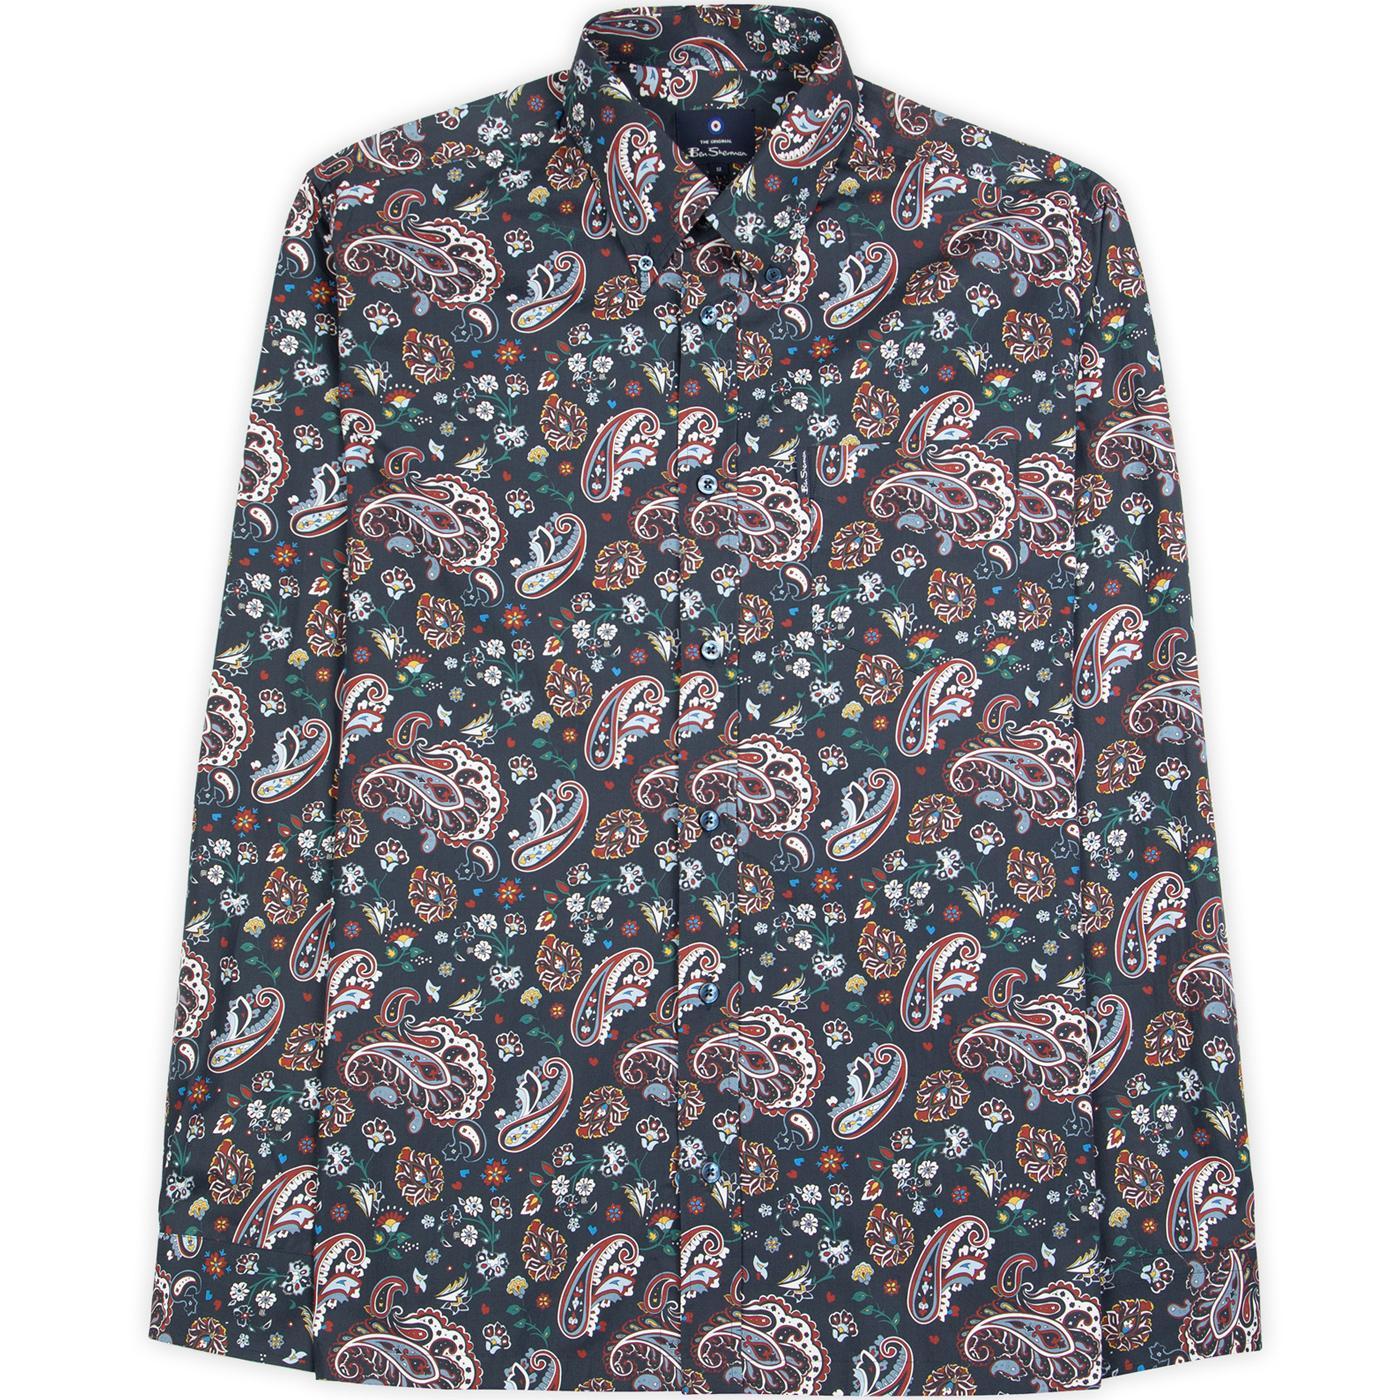 BEN SHERMAN 60s Mod Psychedelic Paisley Shirt (DN)